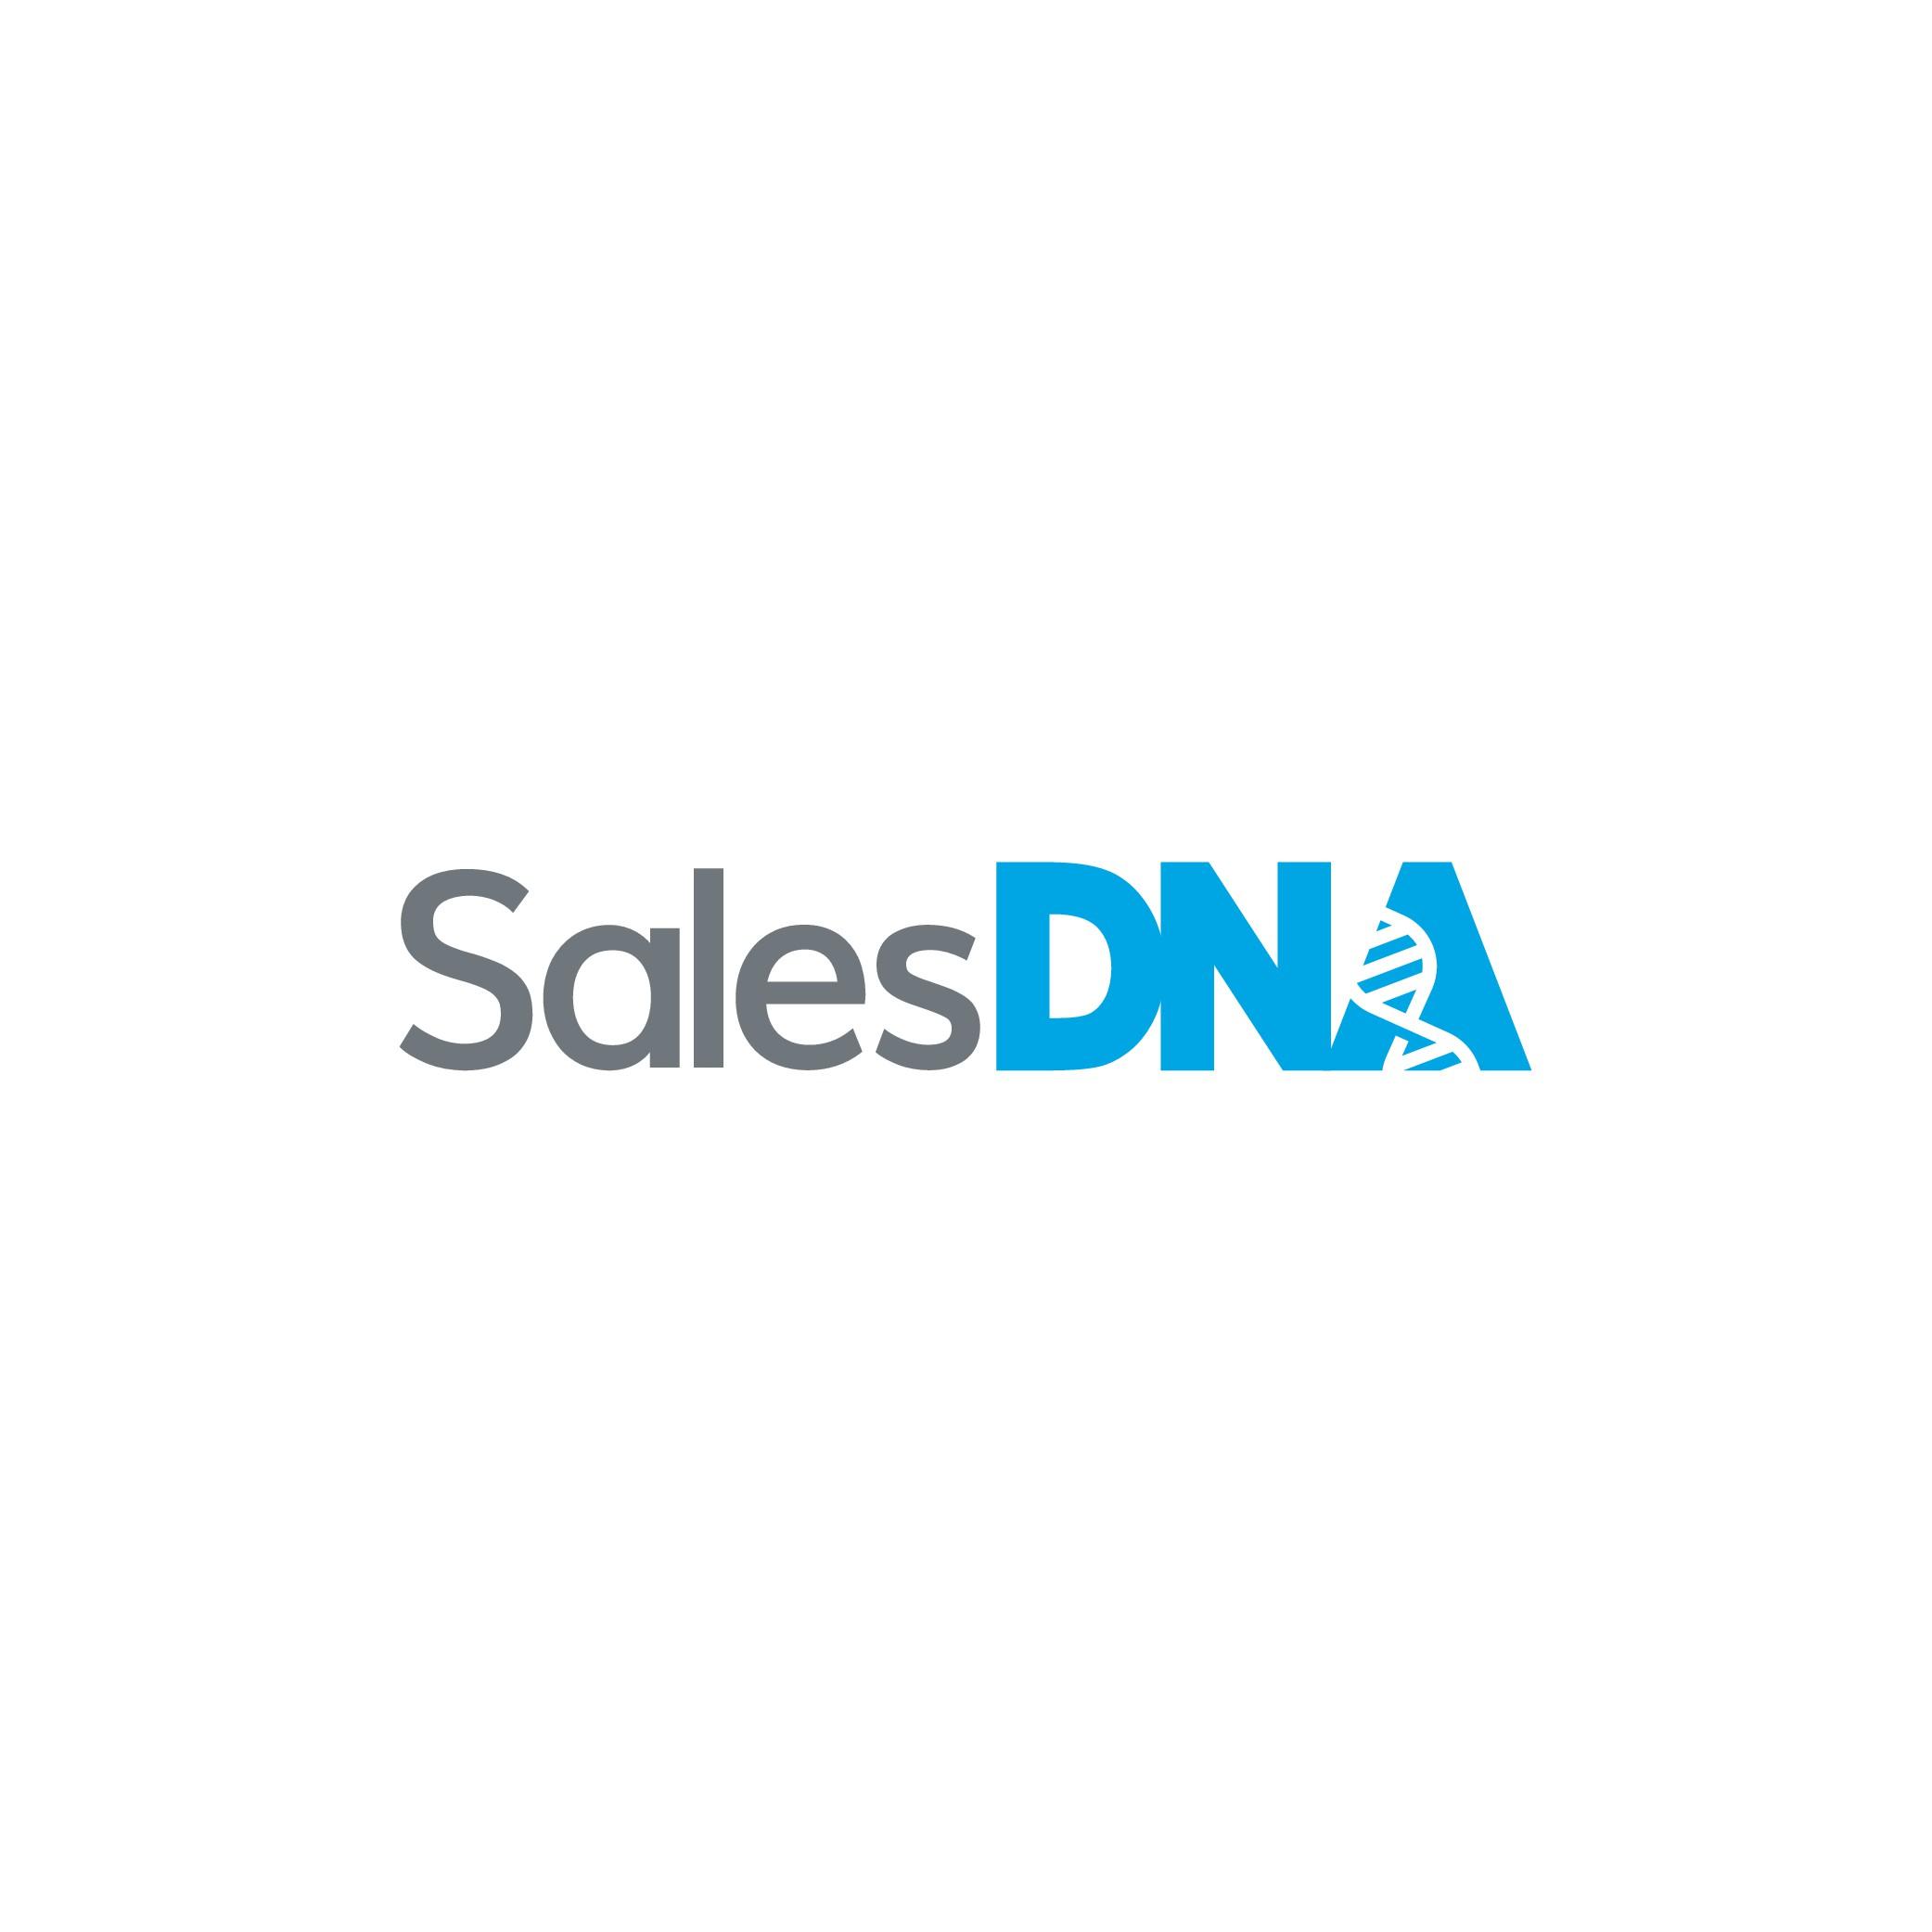 Design a modern, minimalist wordmark logo for SalesDNA